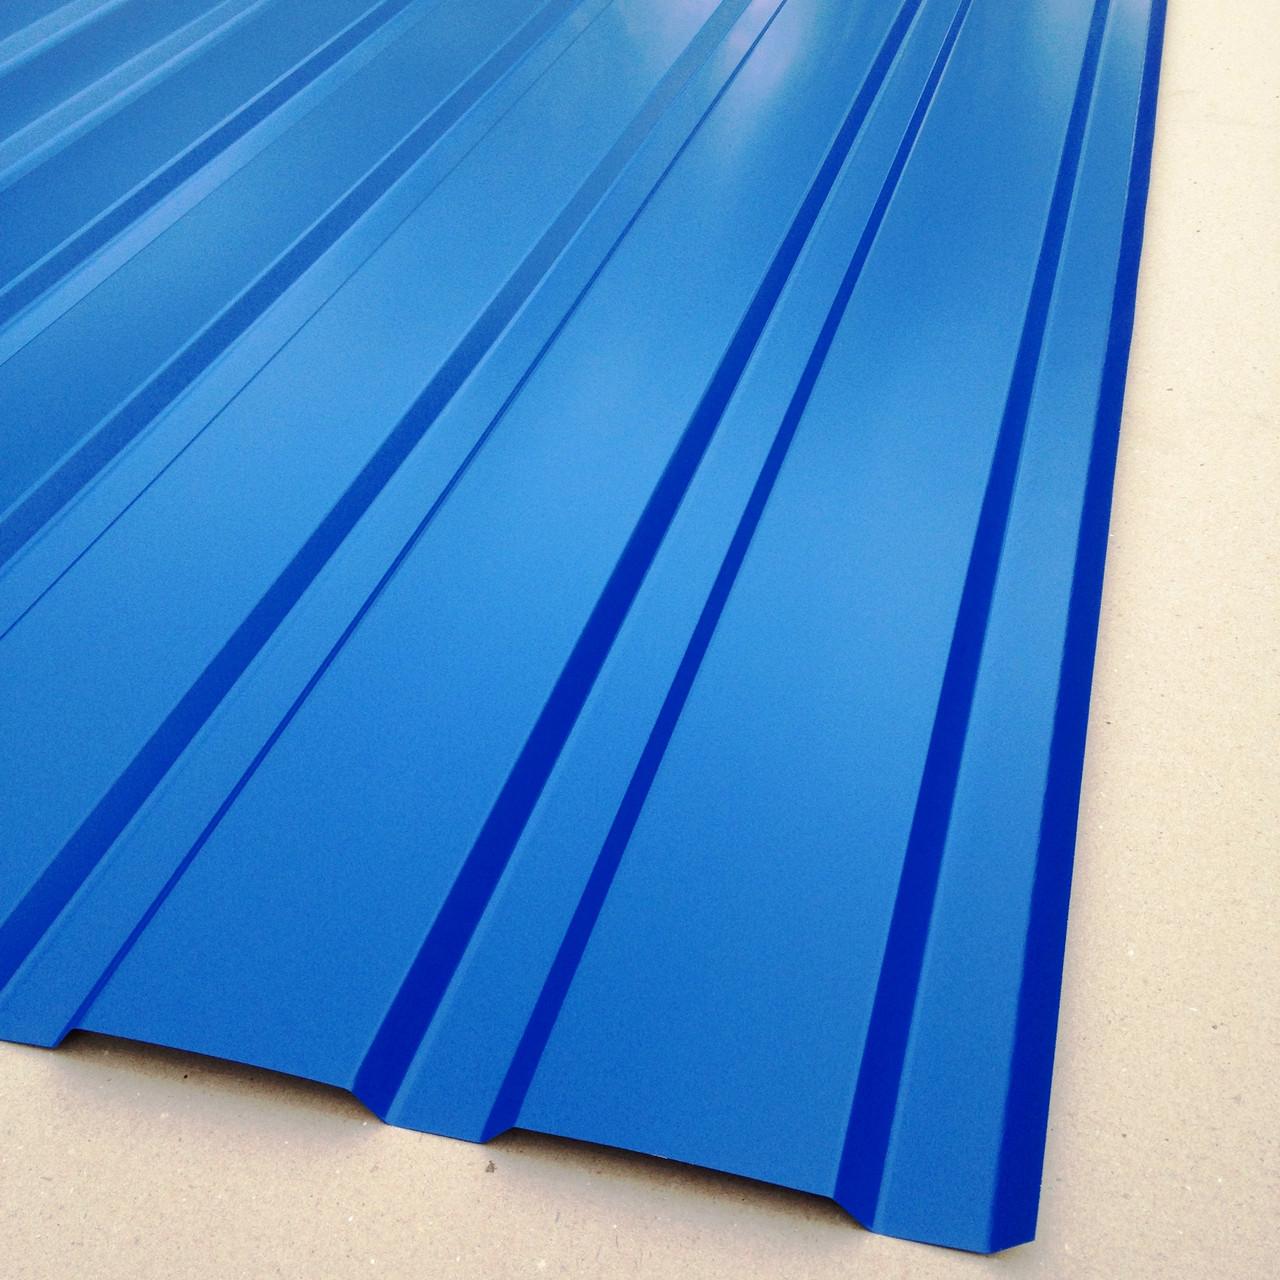 Профнастил Синий ПС-20, 0,30мм; высота 2,0 метра ширина 1,16 м